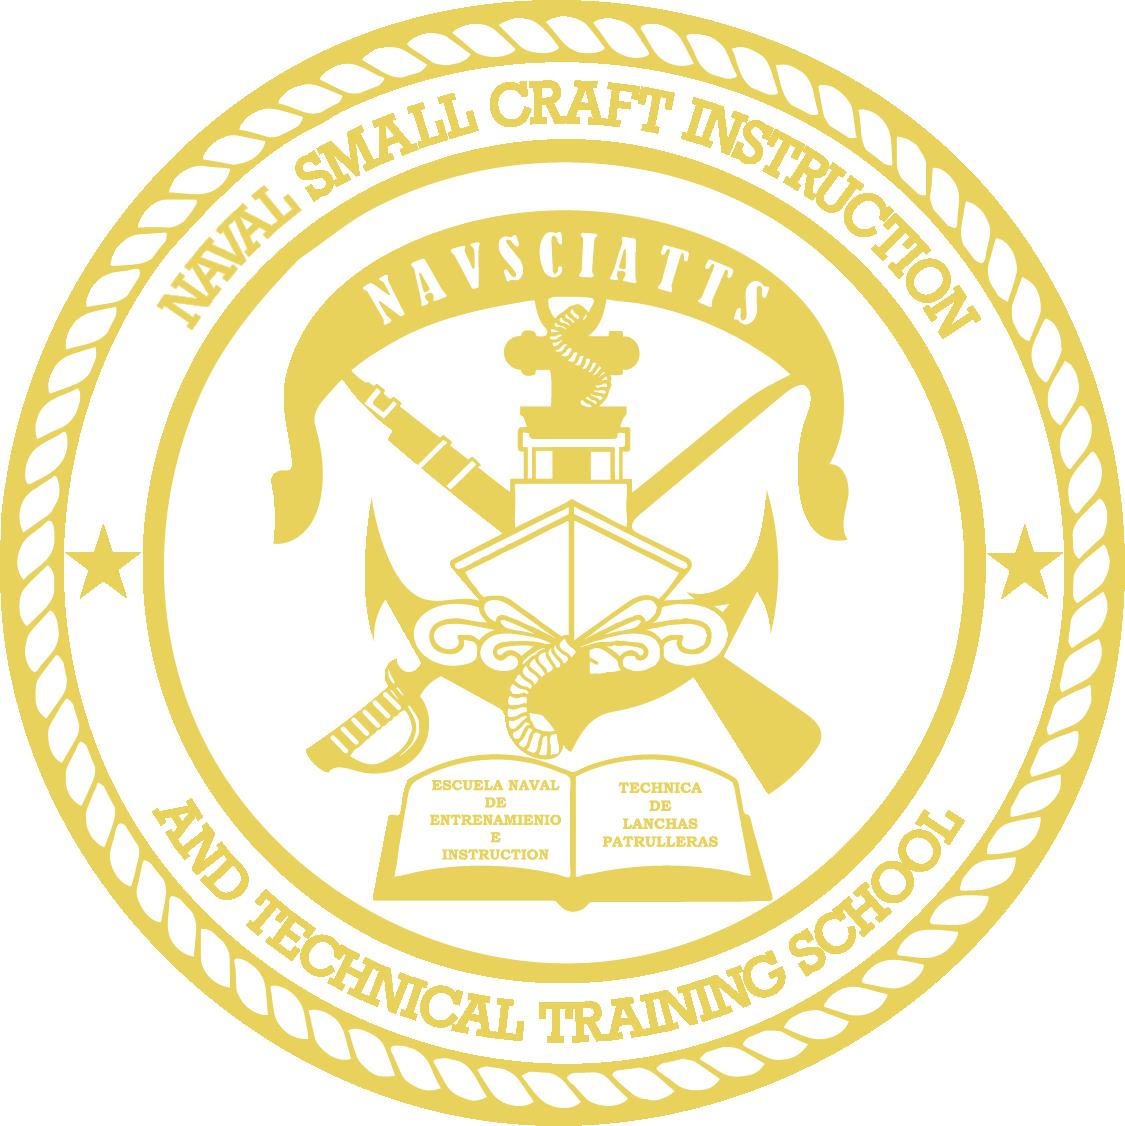 Milart united states navy navsciatts simulated gold biocorpaavc Gallery